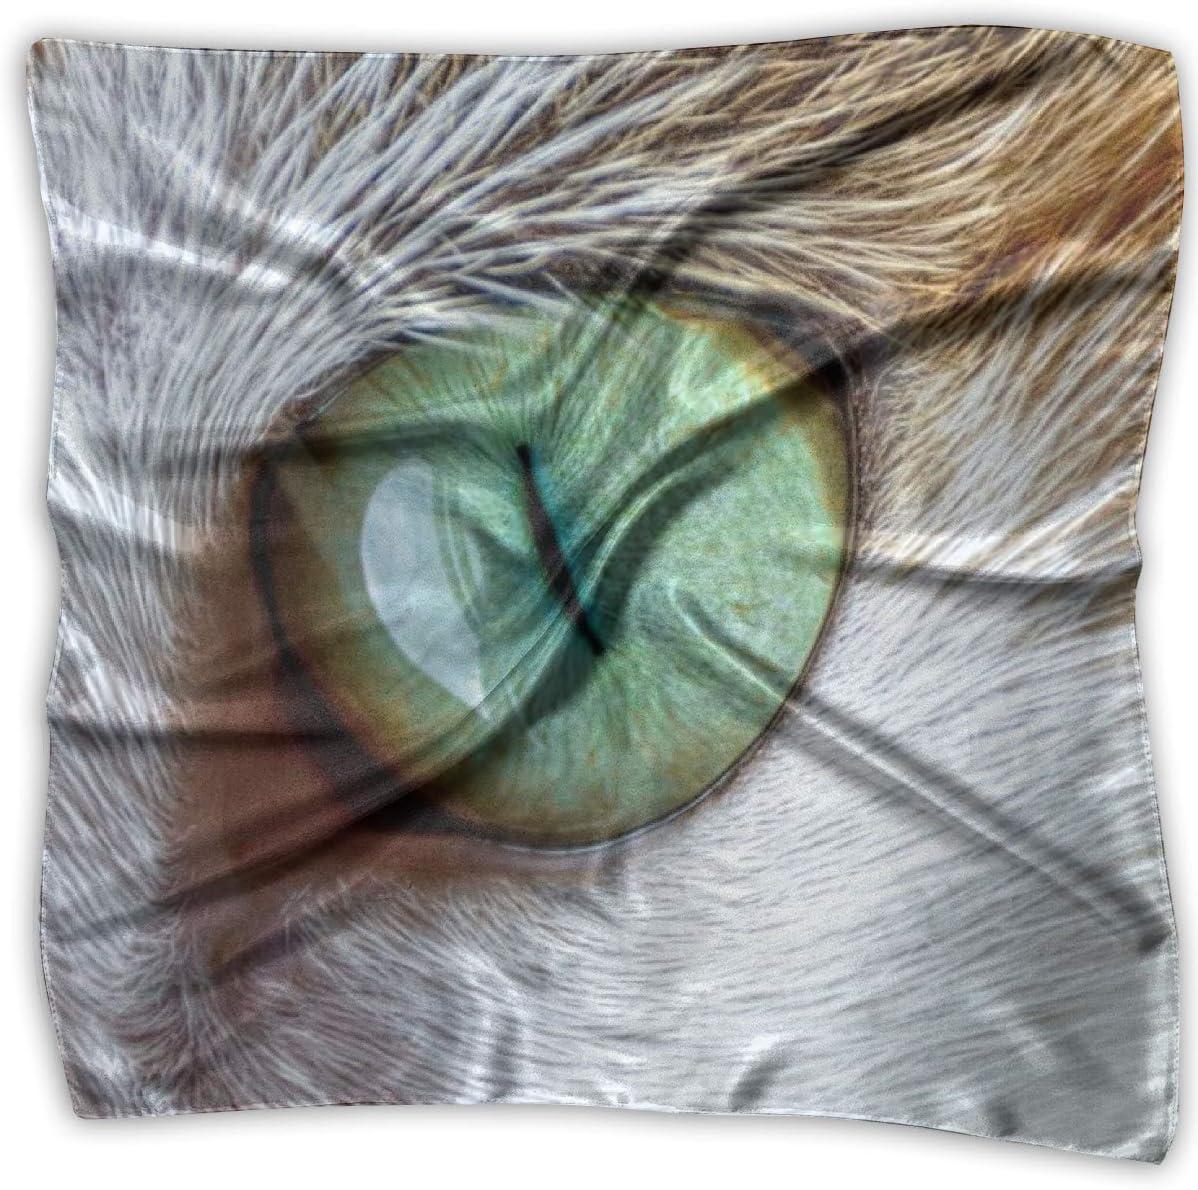 Pañuelo Seda Estampado Ojo De Gato Verde Pañuelo Cuadrado Pequeño Pañuelo Tendencia